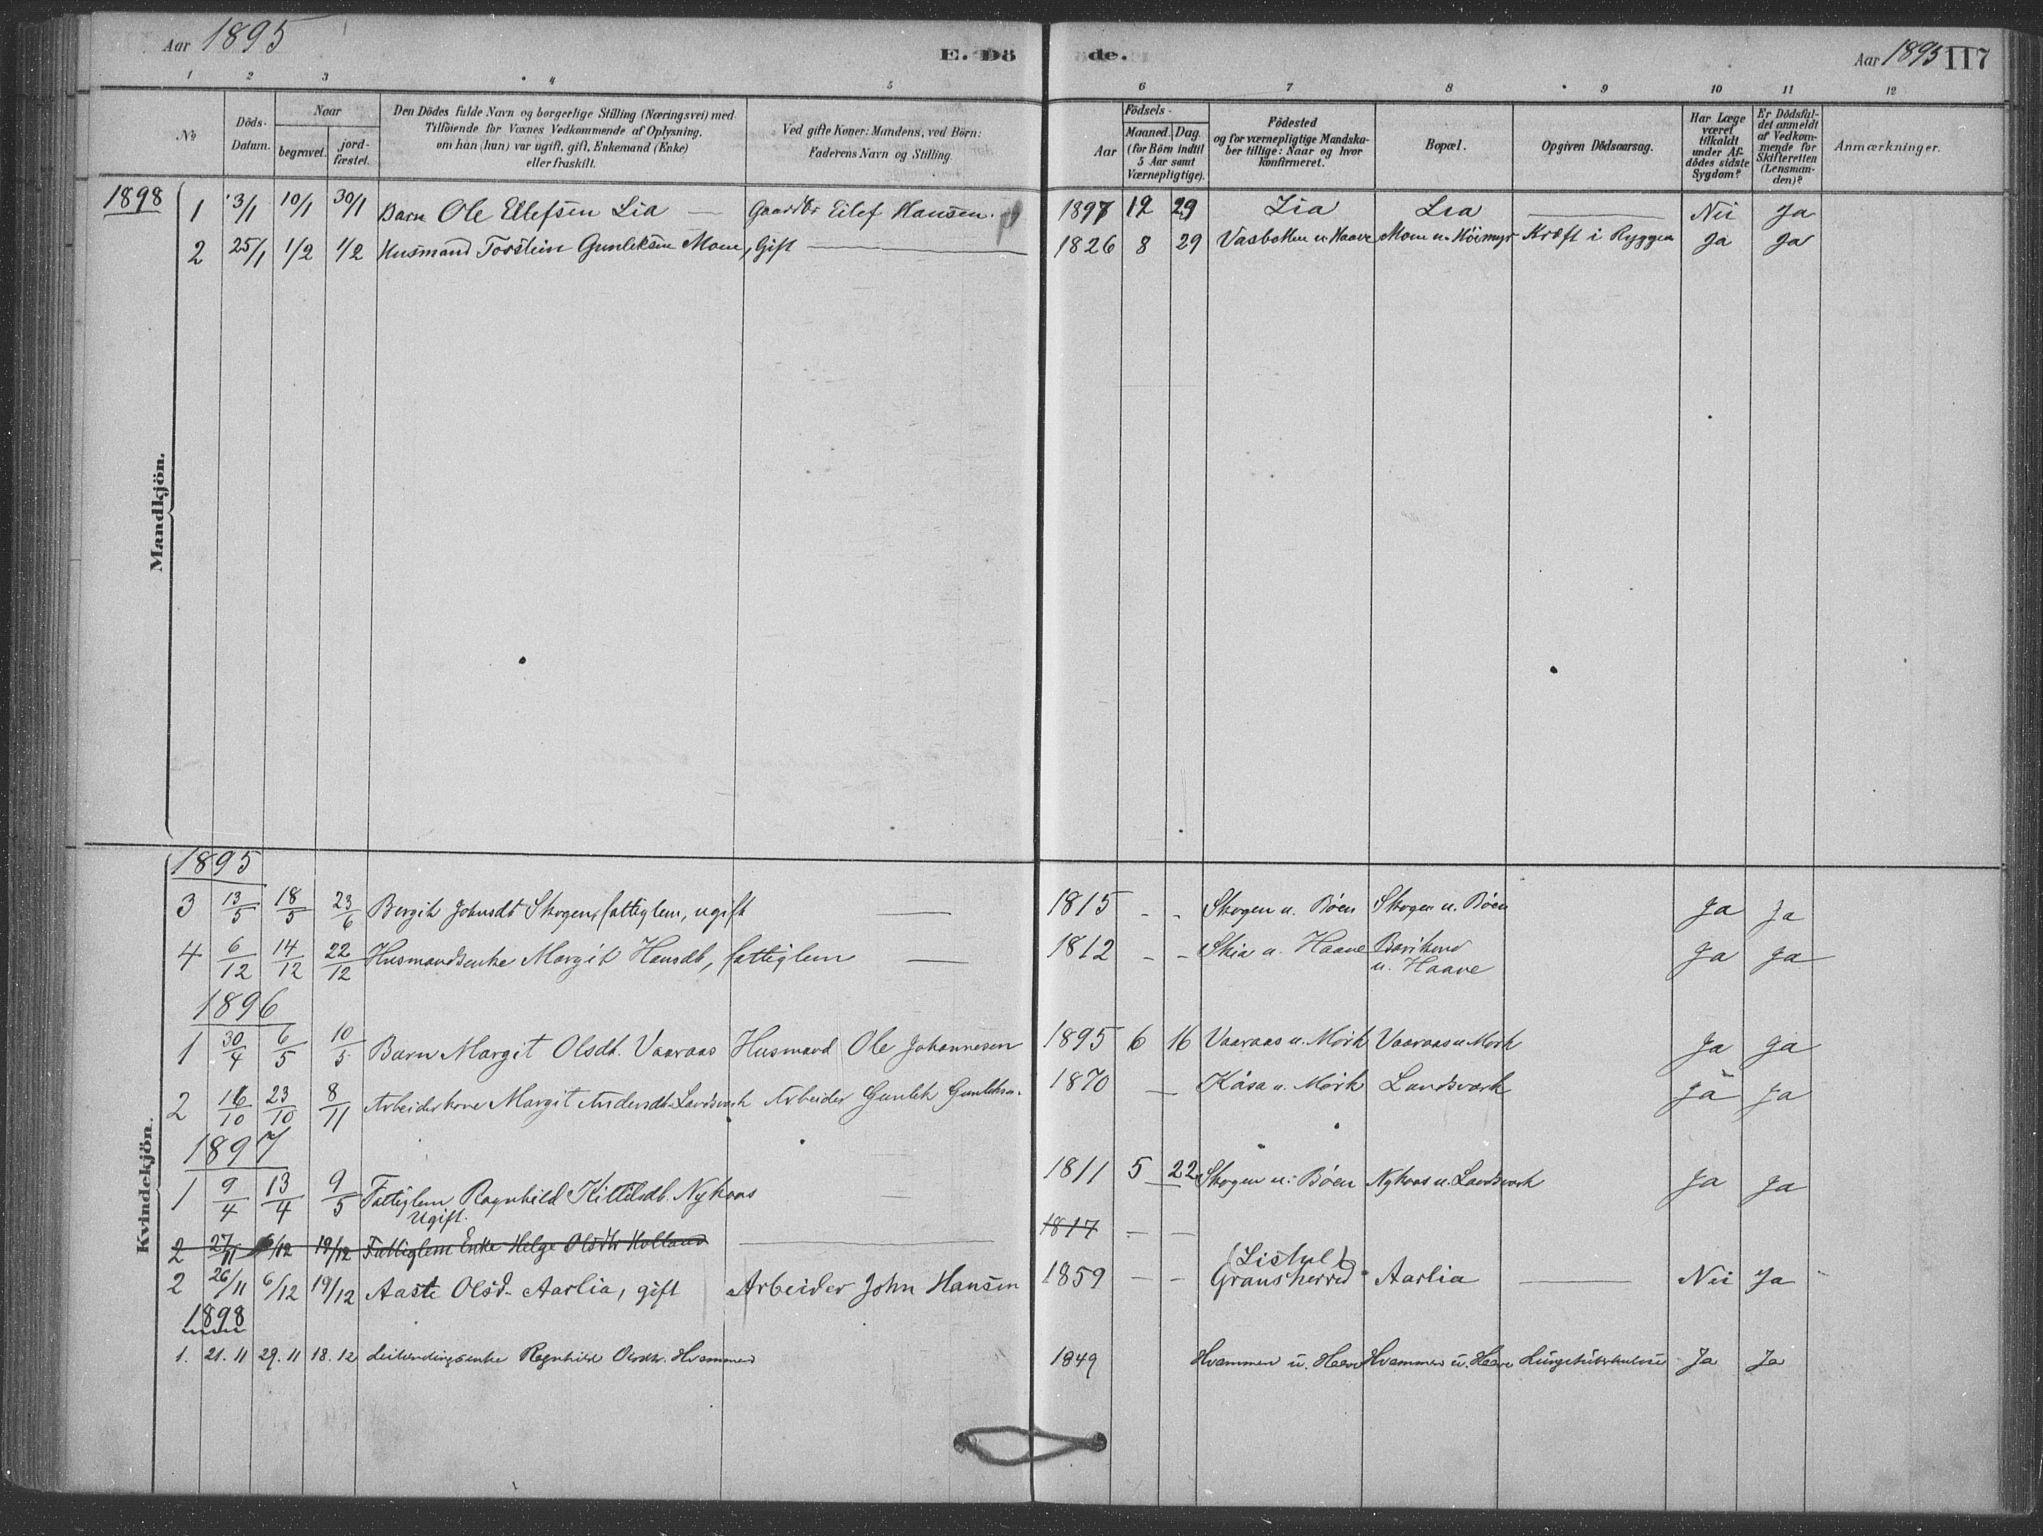 SAKO, Heddal kirkebøker, F/Fb/L0002: Ministerialbok nr. II 2, 1878-1913, s. 117